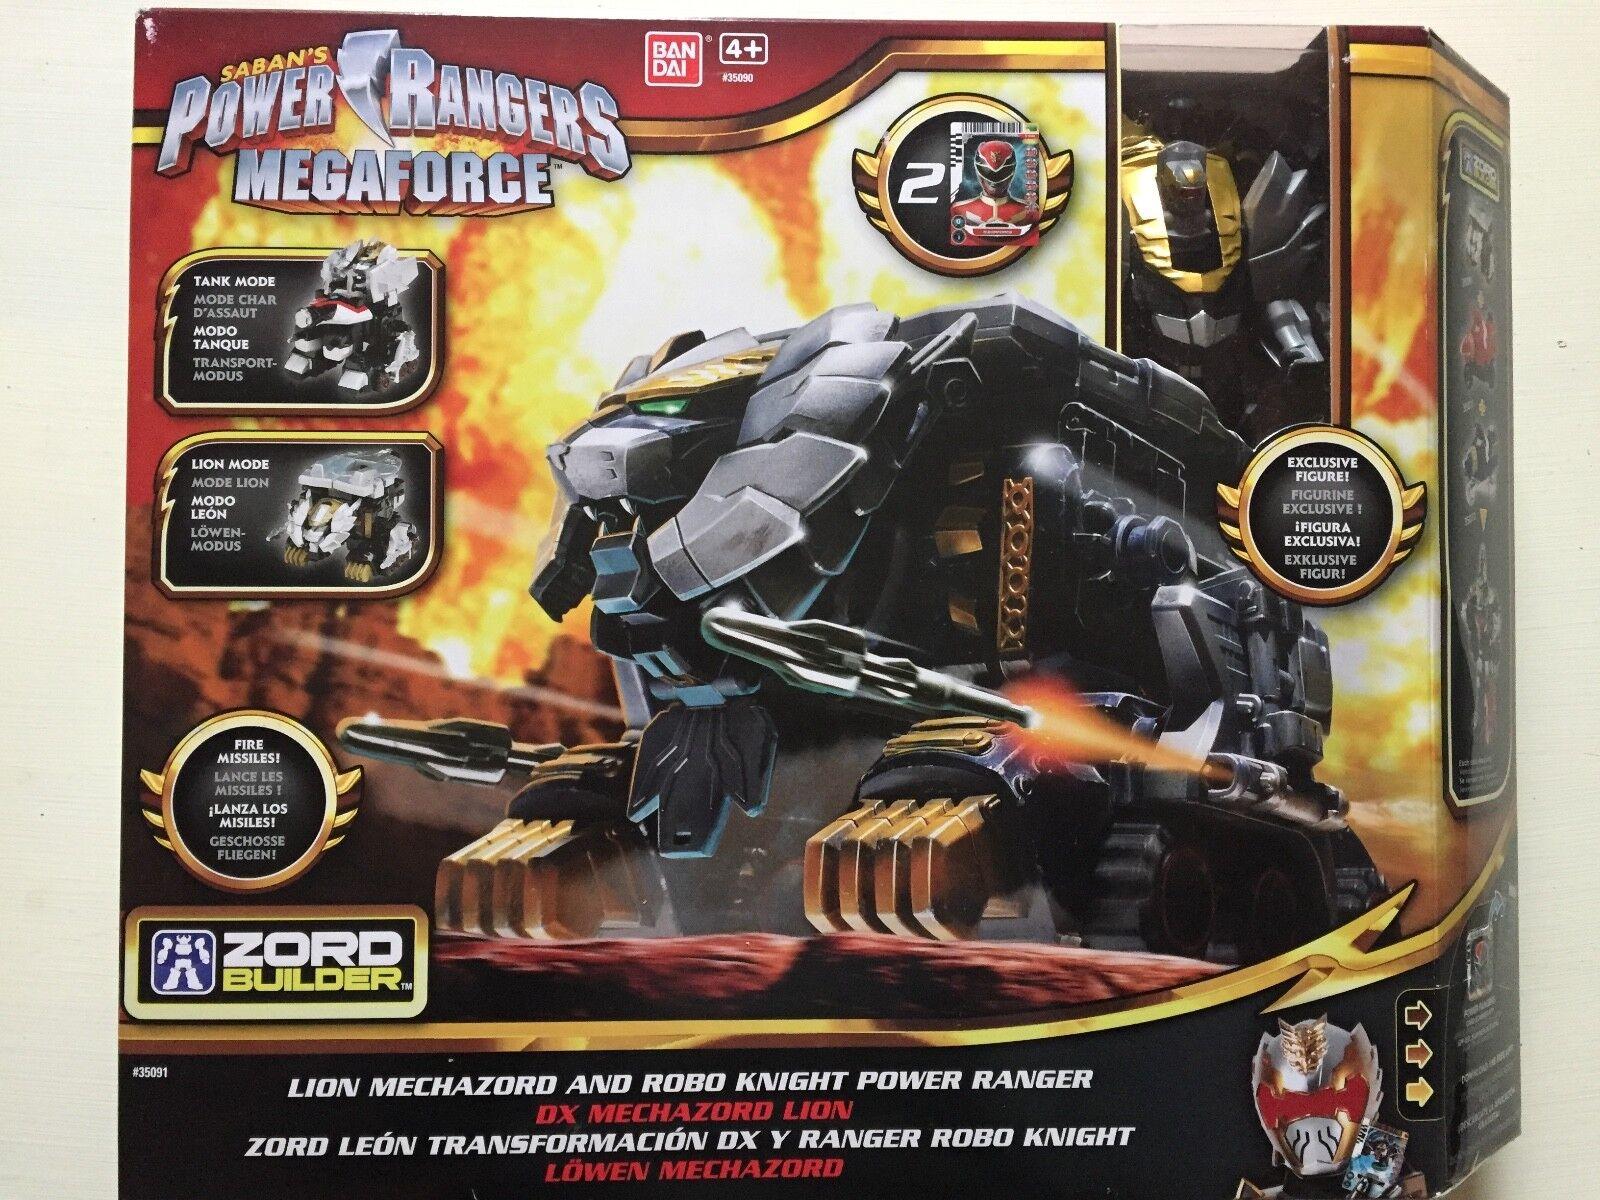 POWER RANGERS MEGAFORCE LION MACHAZORD AND ROBO KNIGHT POWER RANGER